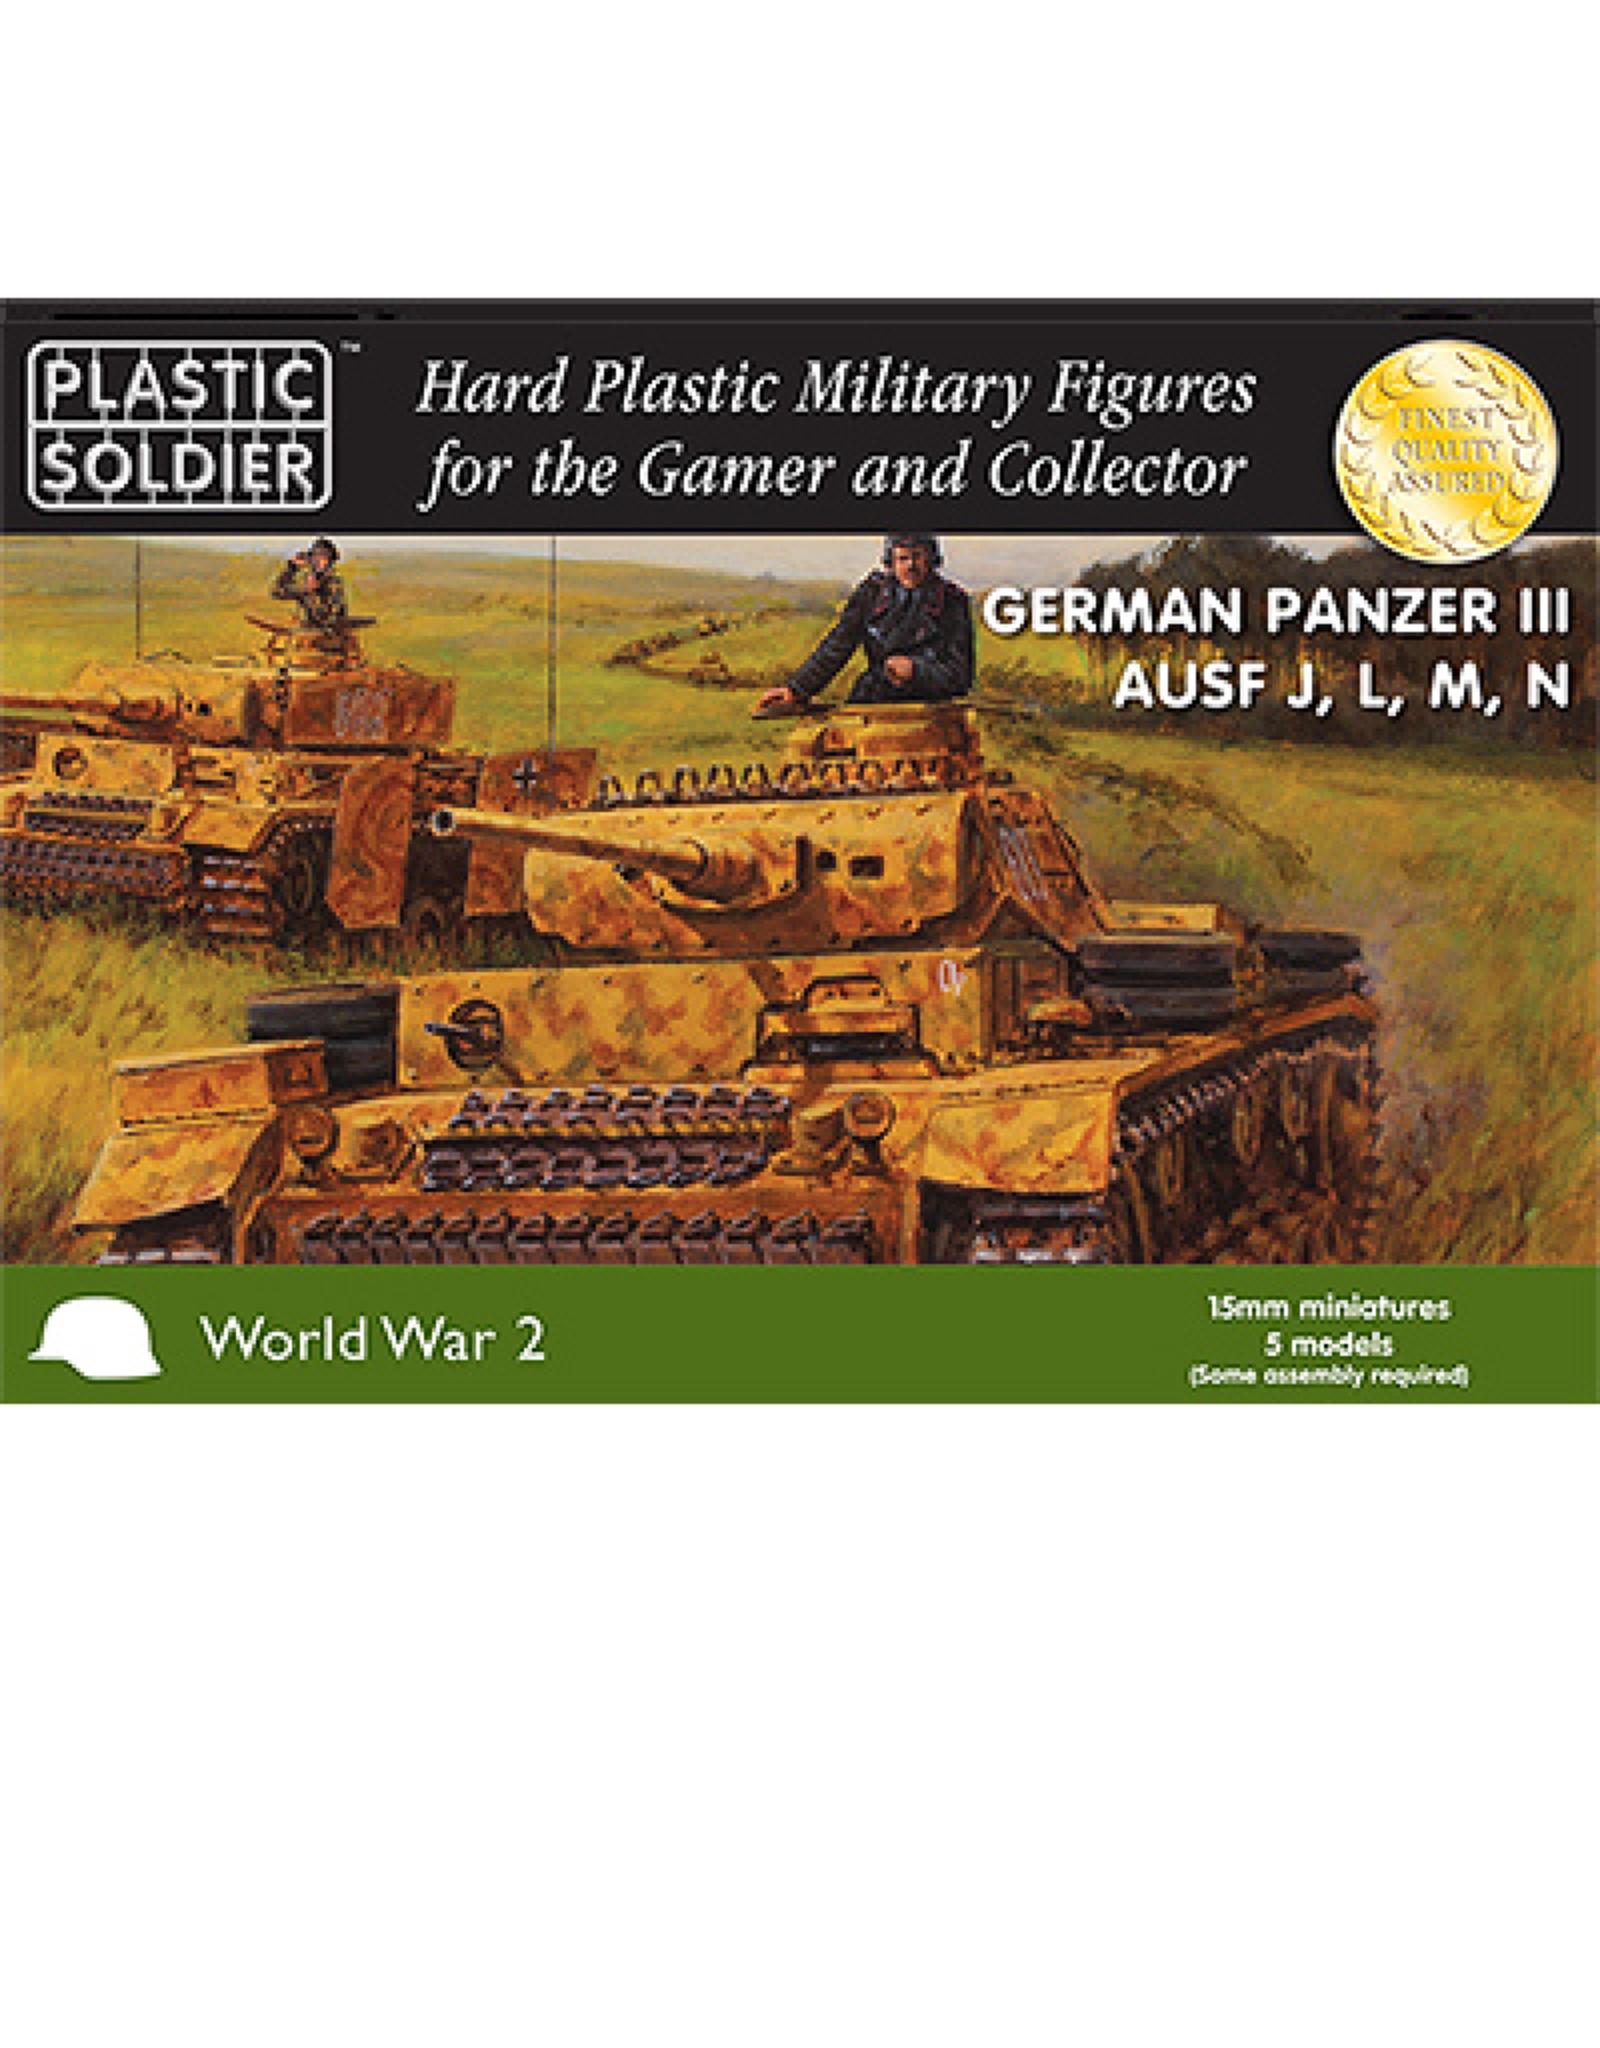 Plastic Soldier Company German Panzer III Ausf J, L, M, N